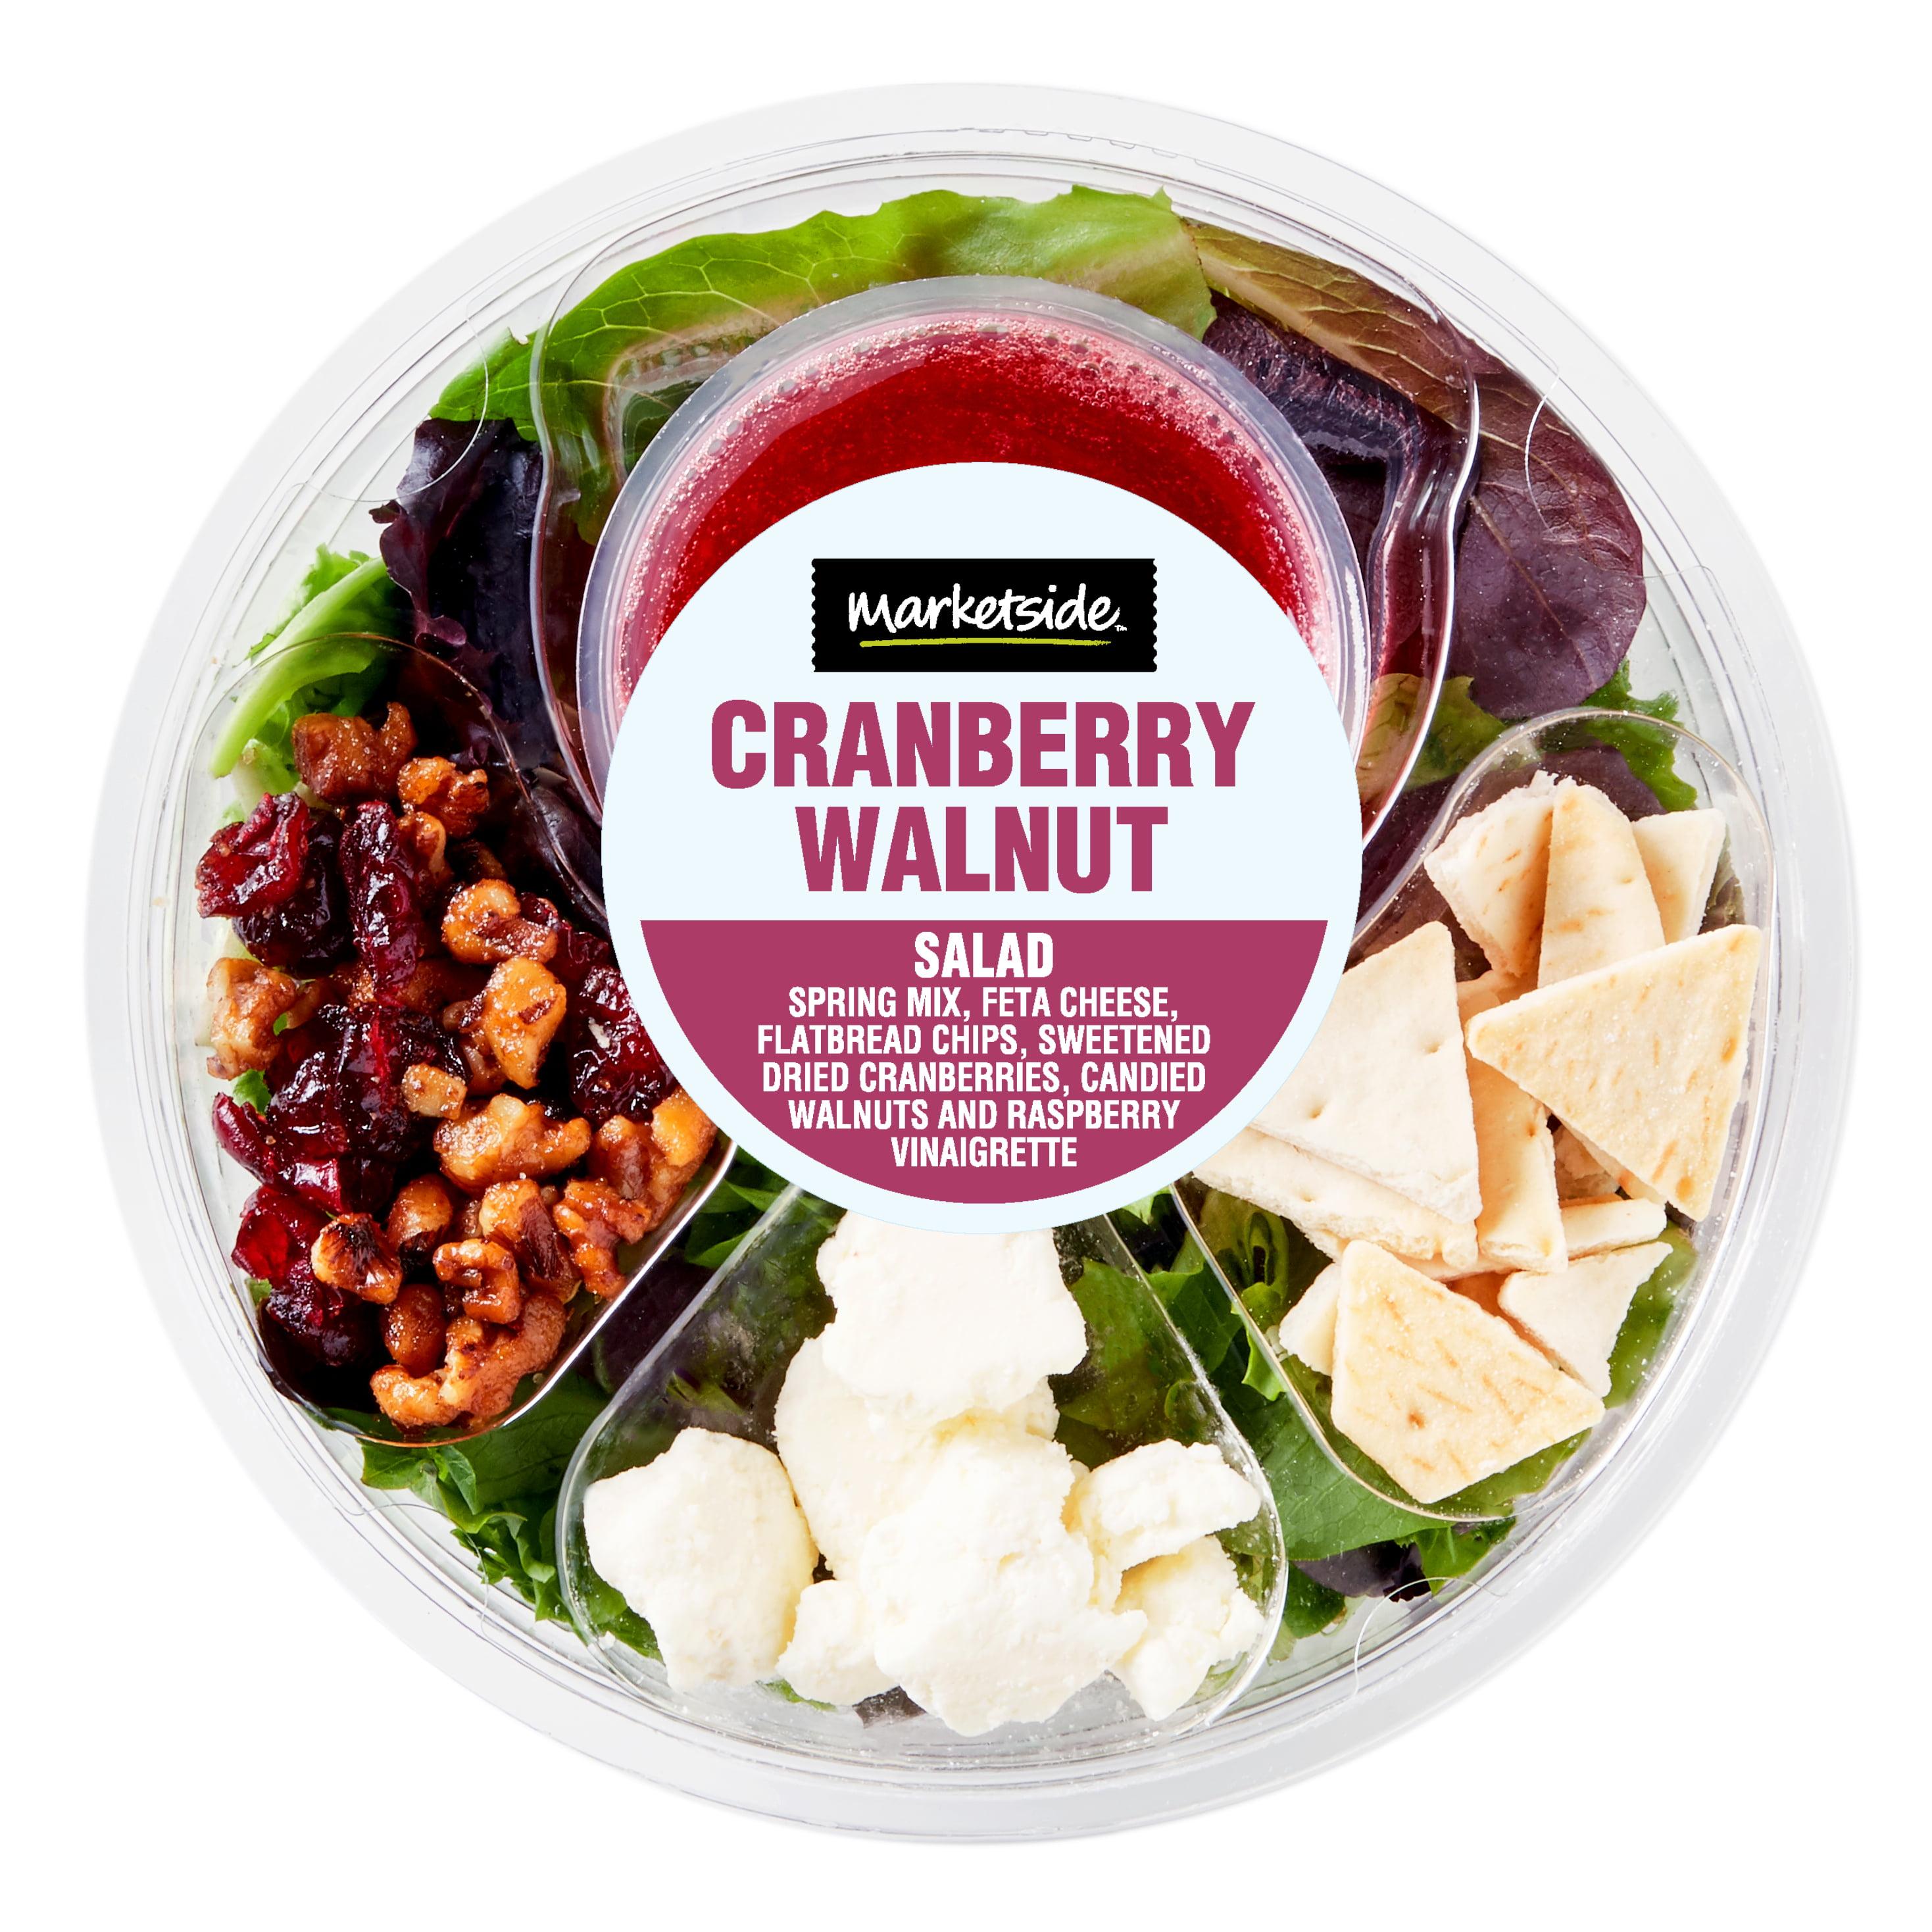 Marketside Cranberry Walnut Salad 4.5oz